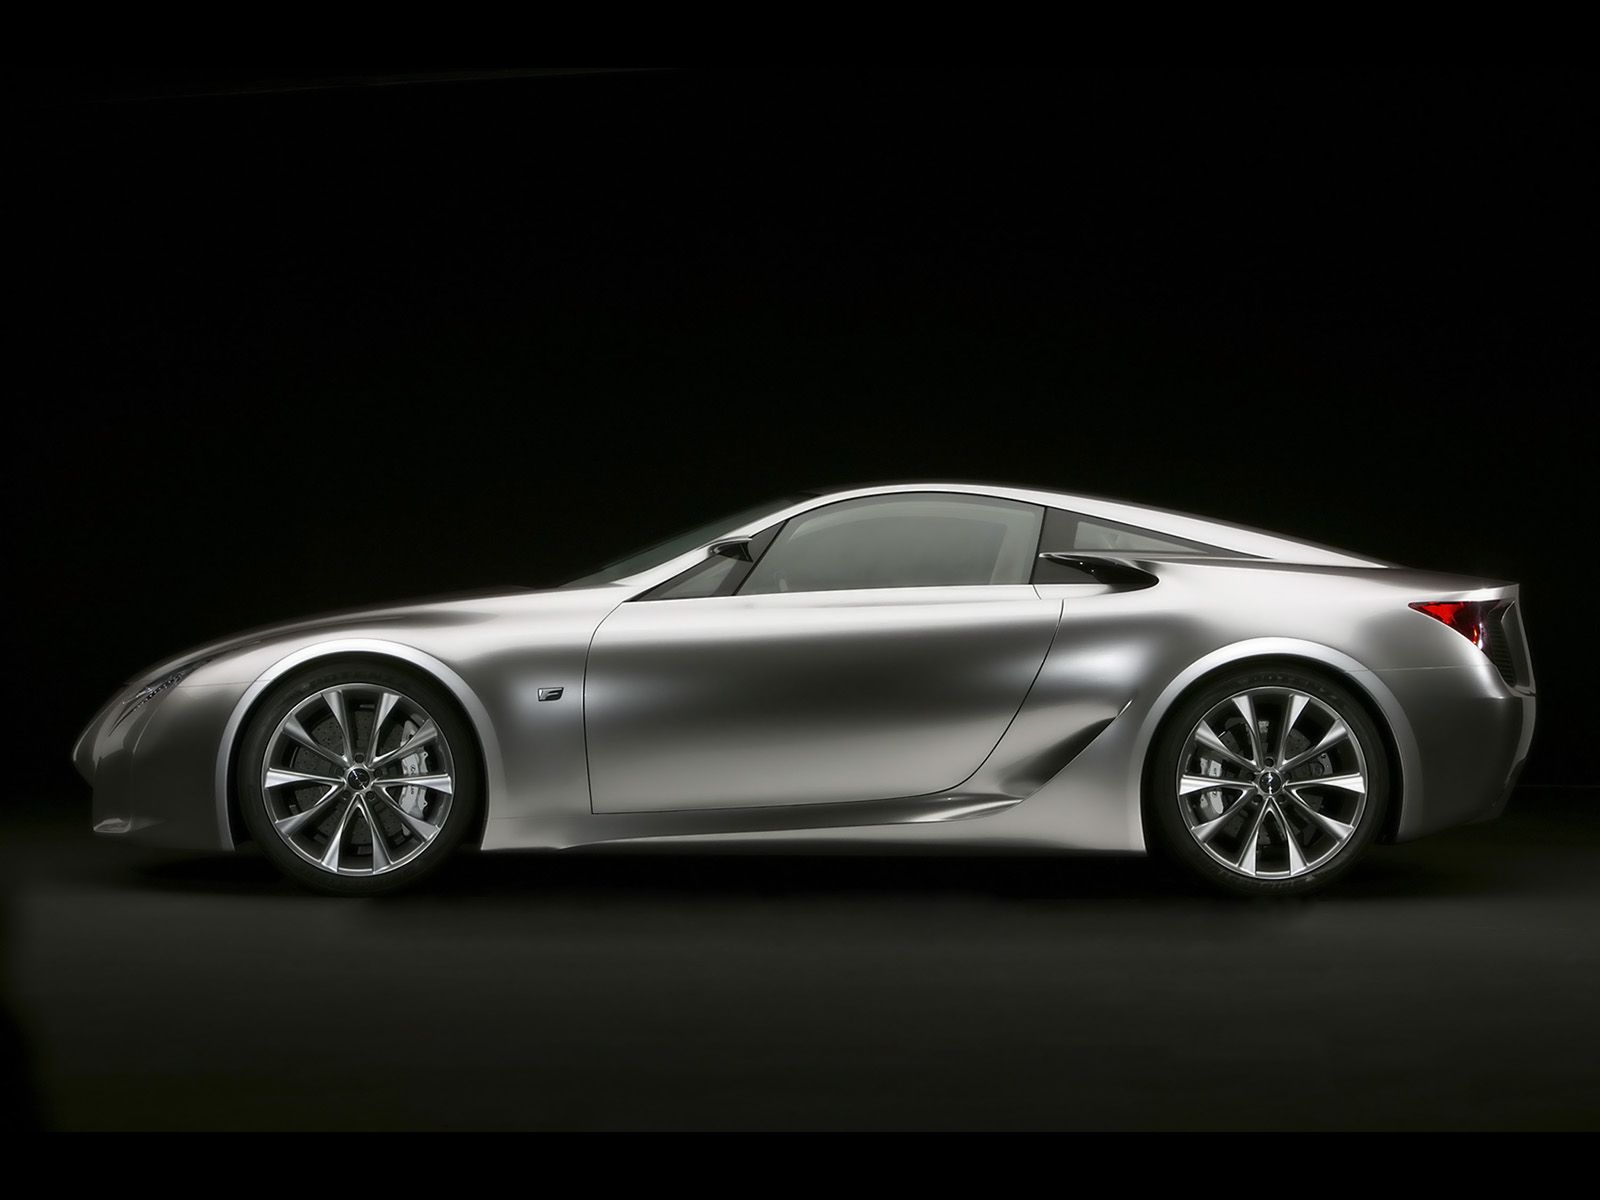 2007 Lexus LF A Sports Car Concept   Side   1600x1200   Wallpaper Gallery